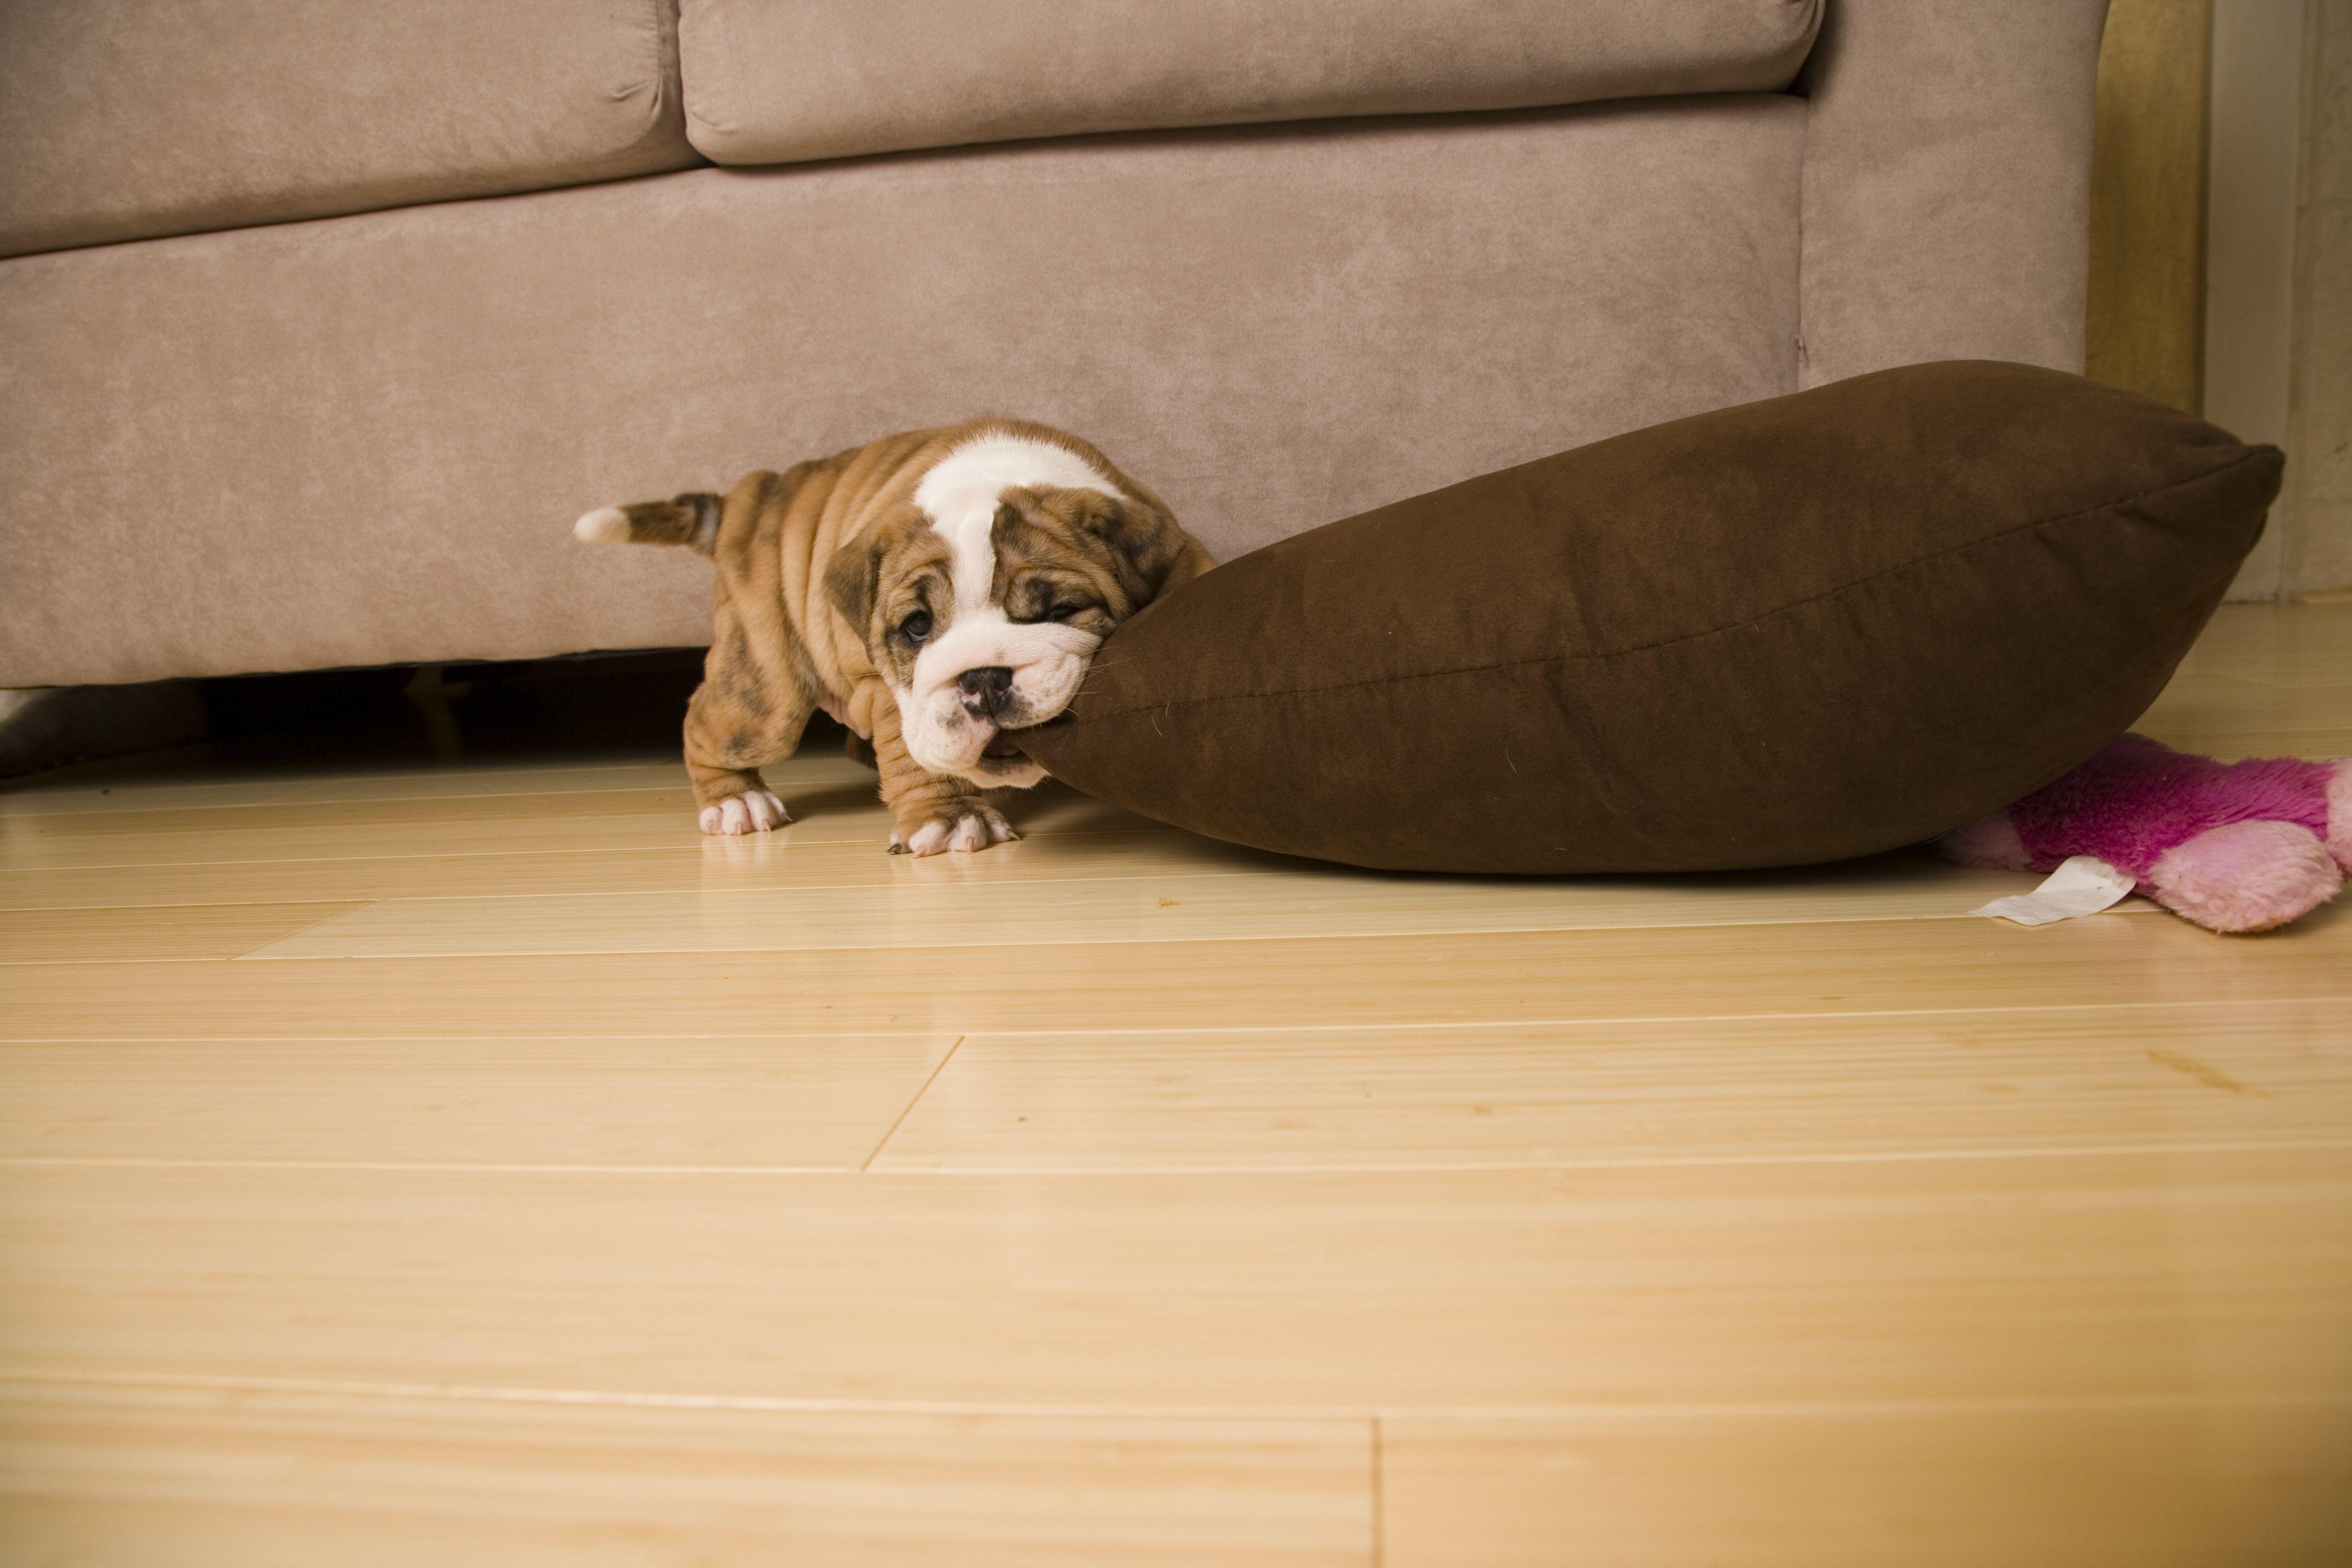 English Bulldog puppy biting pillow